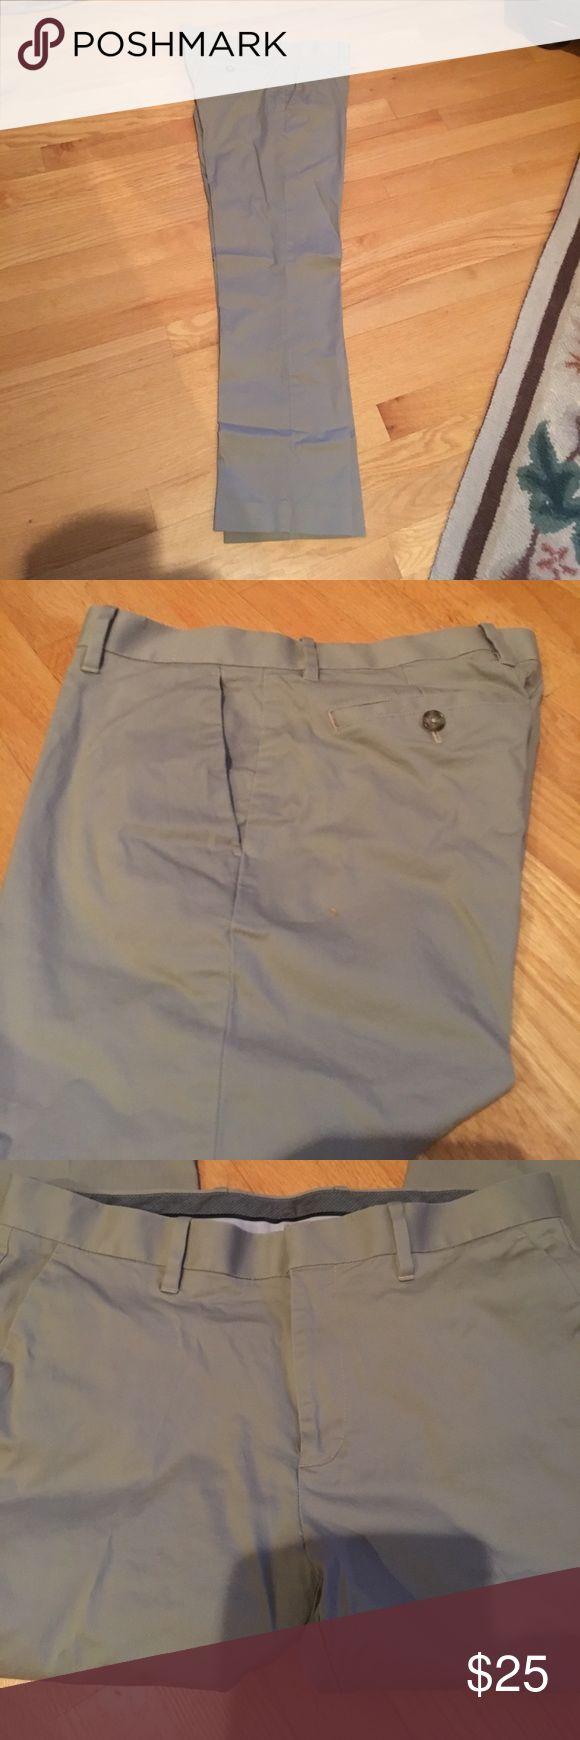 Men's khaki pants Men's MURANO  tan khakis, modern fit, 30 in length. NWOT Willing to deal on bundles. Murano Pants Chinos & Khakis